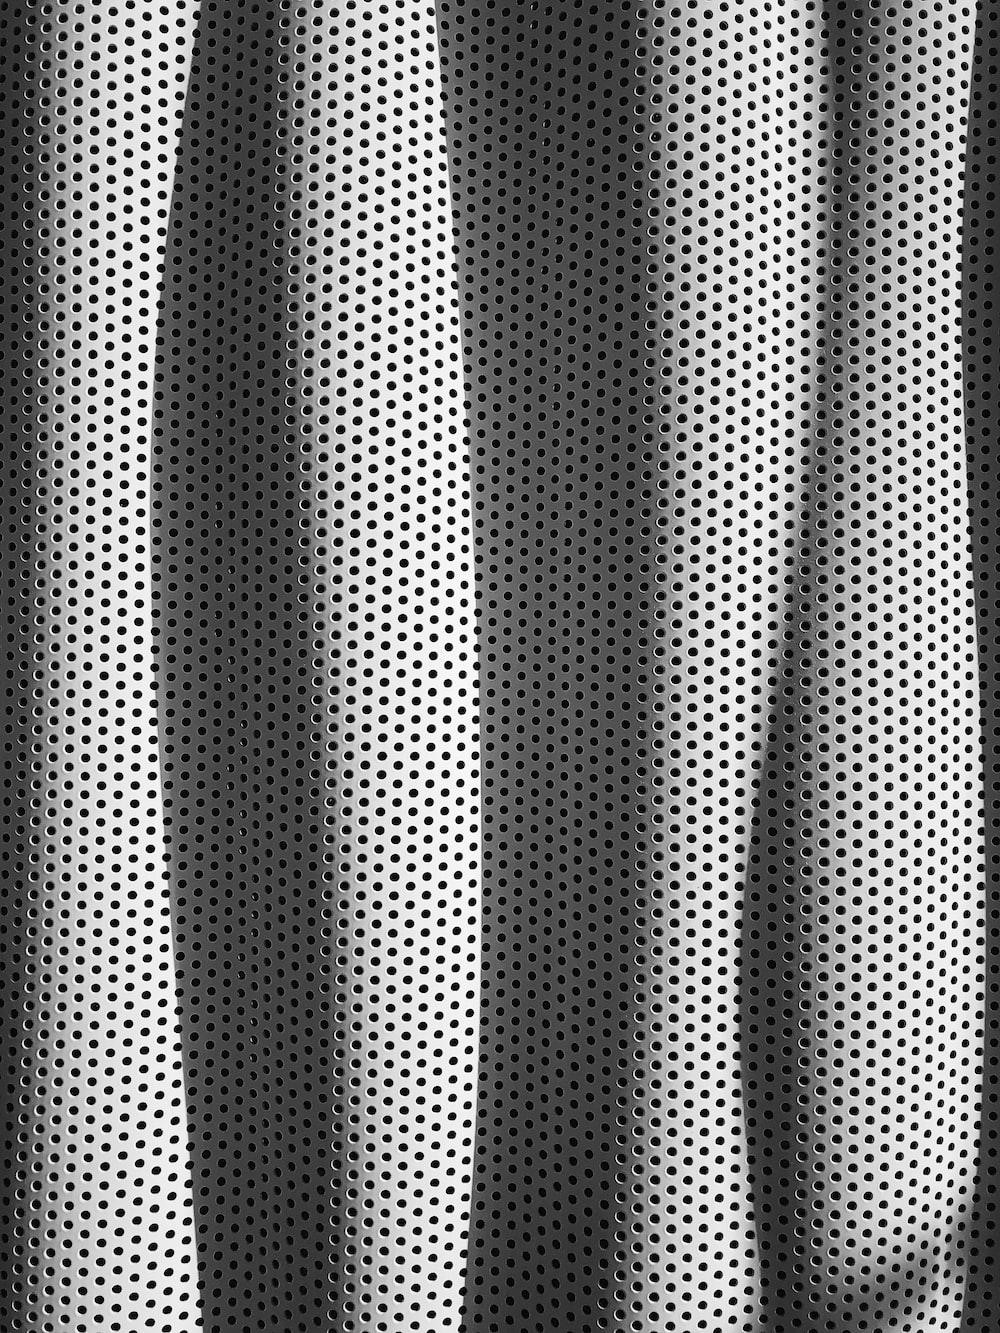 white and black polka-dot fabric